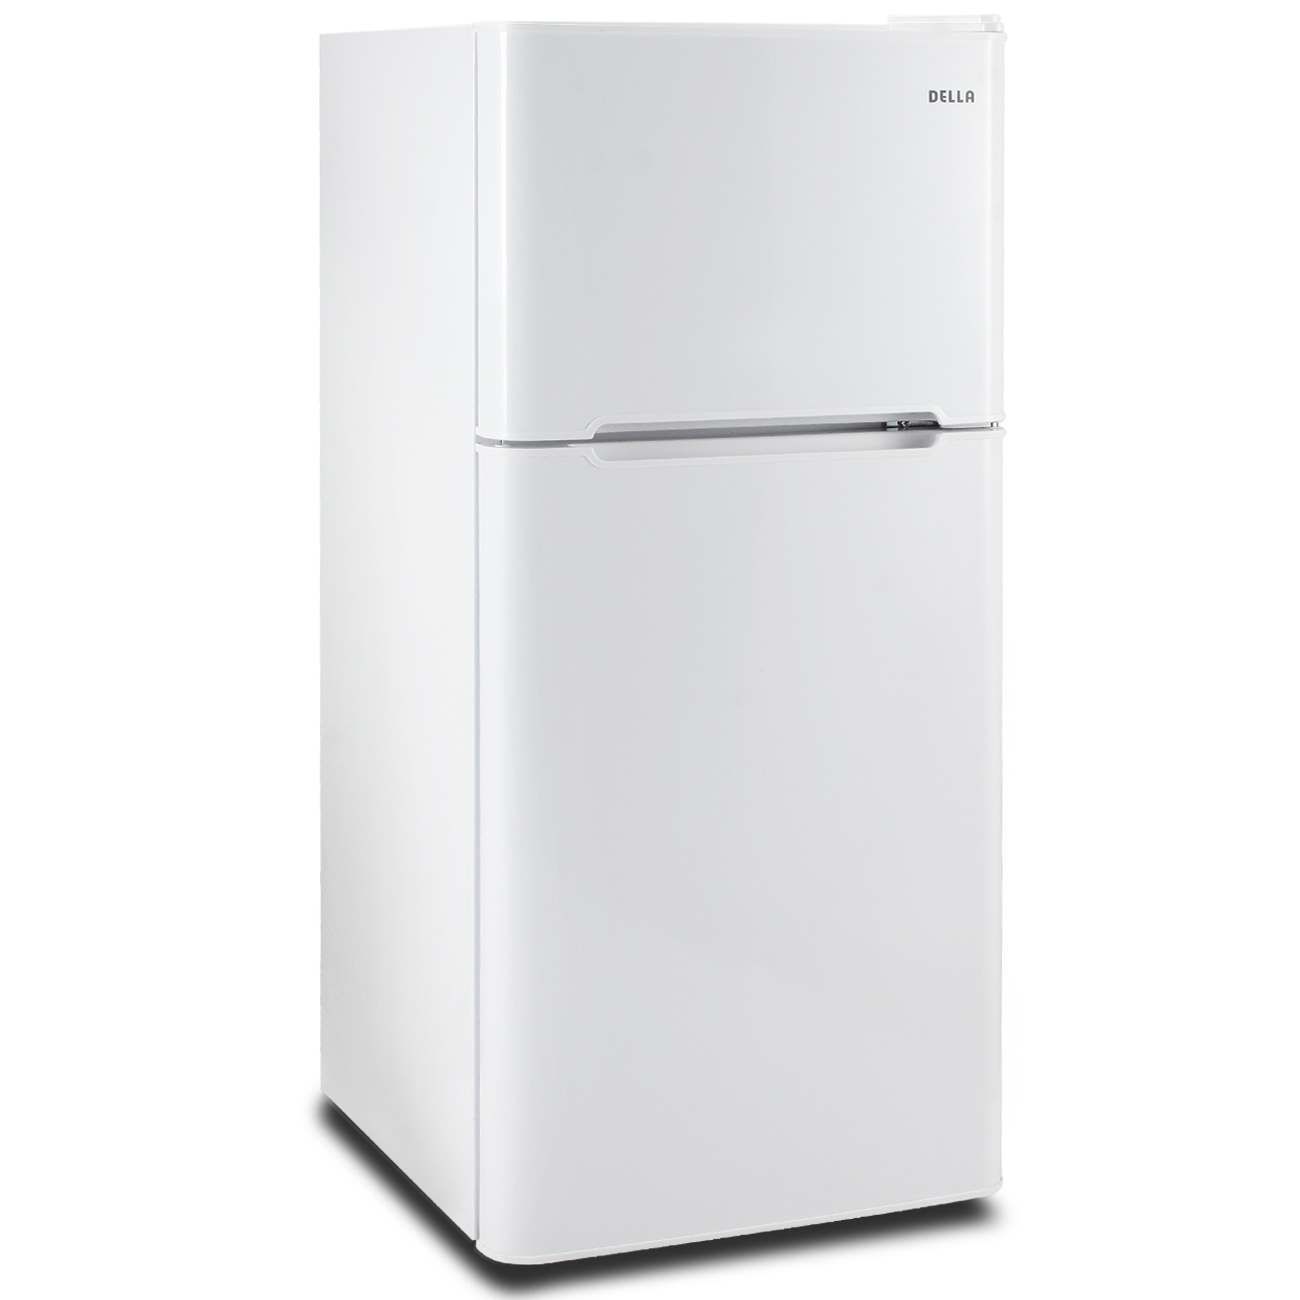 office mini refrigerator. Office Mini Fridge Compact Refrigerator Dorm Freezer Small Home White Door New M